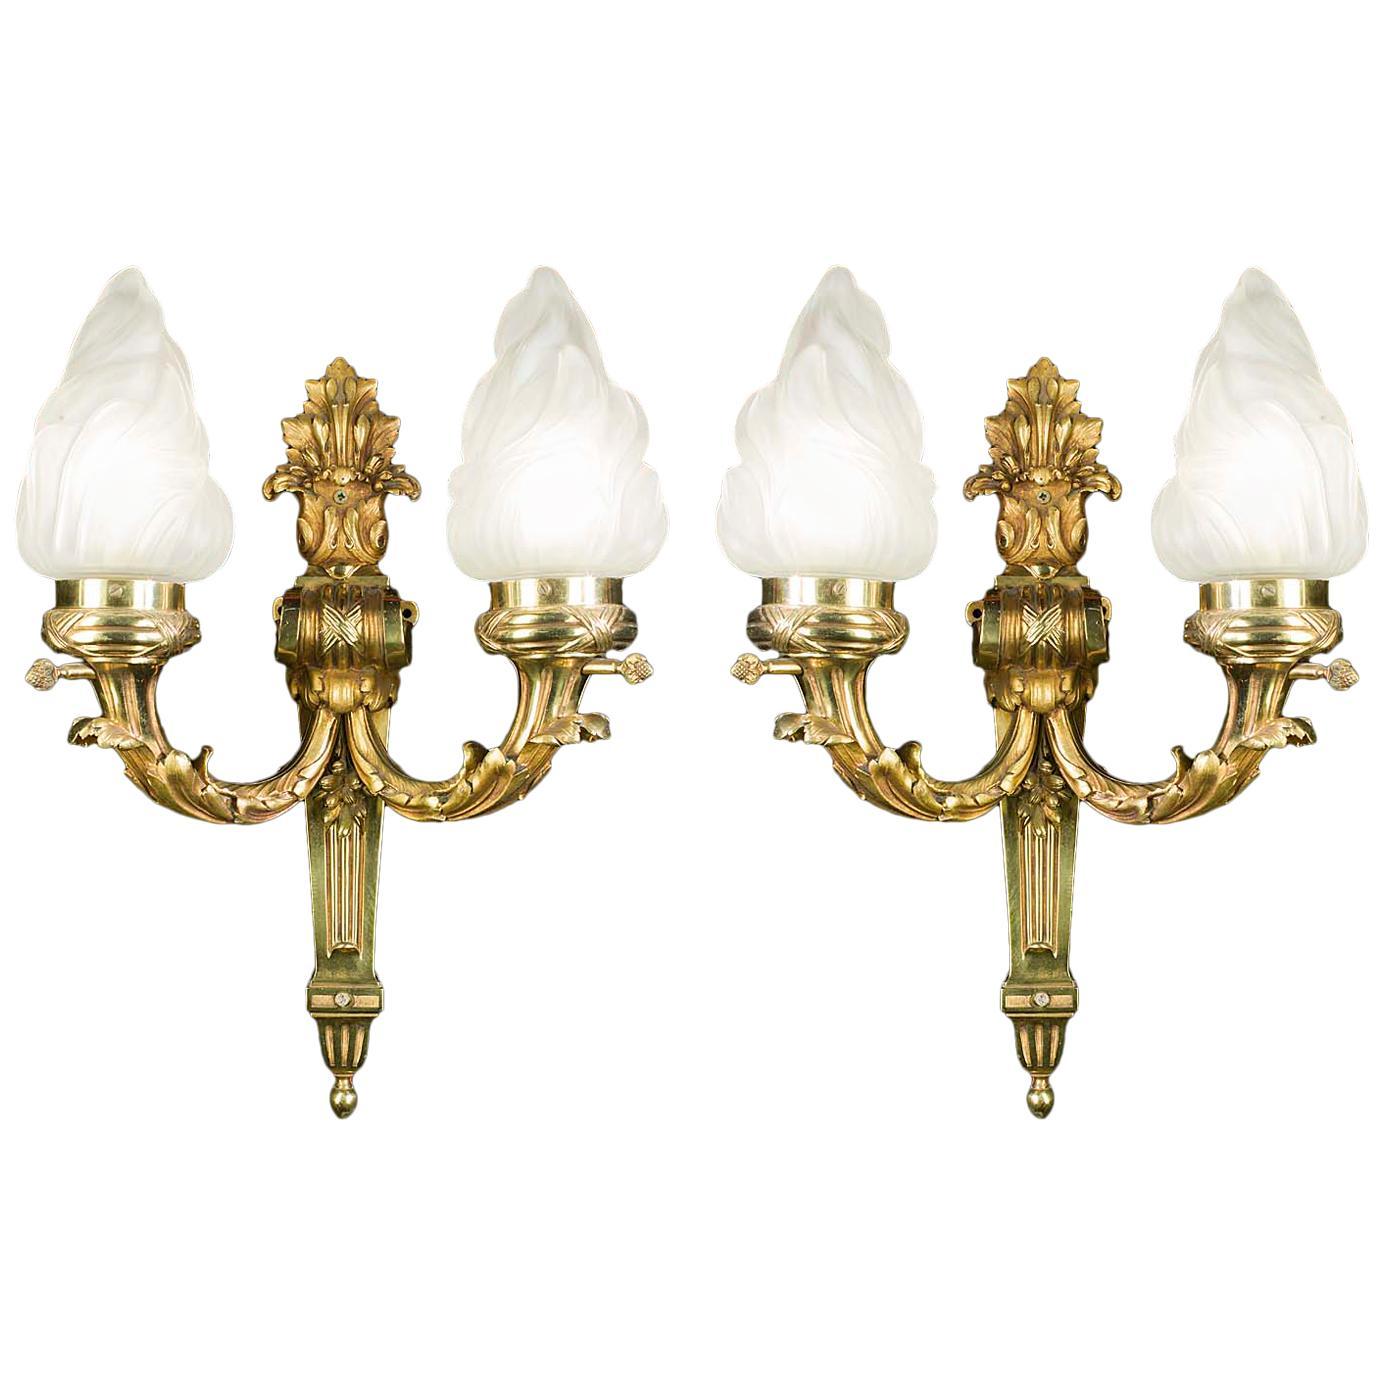 Pair of 19th Century Brass Victorian Wall Lights